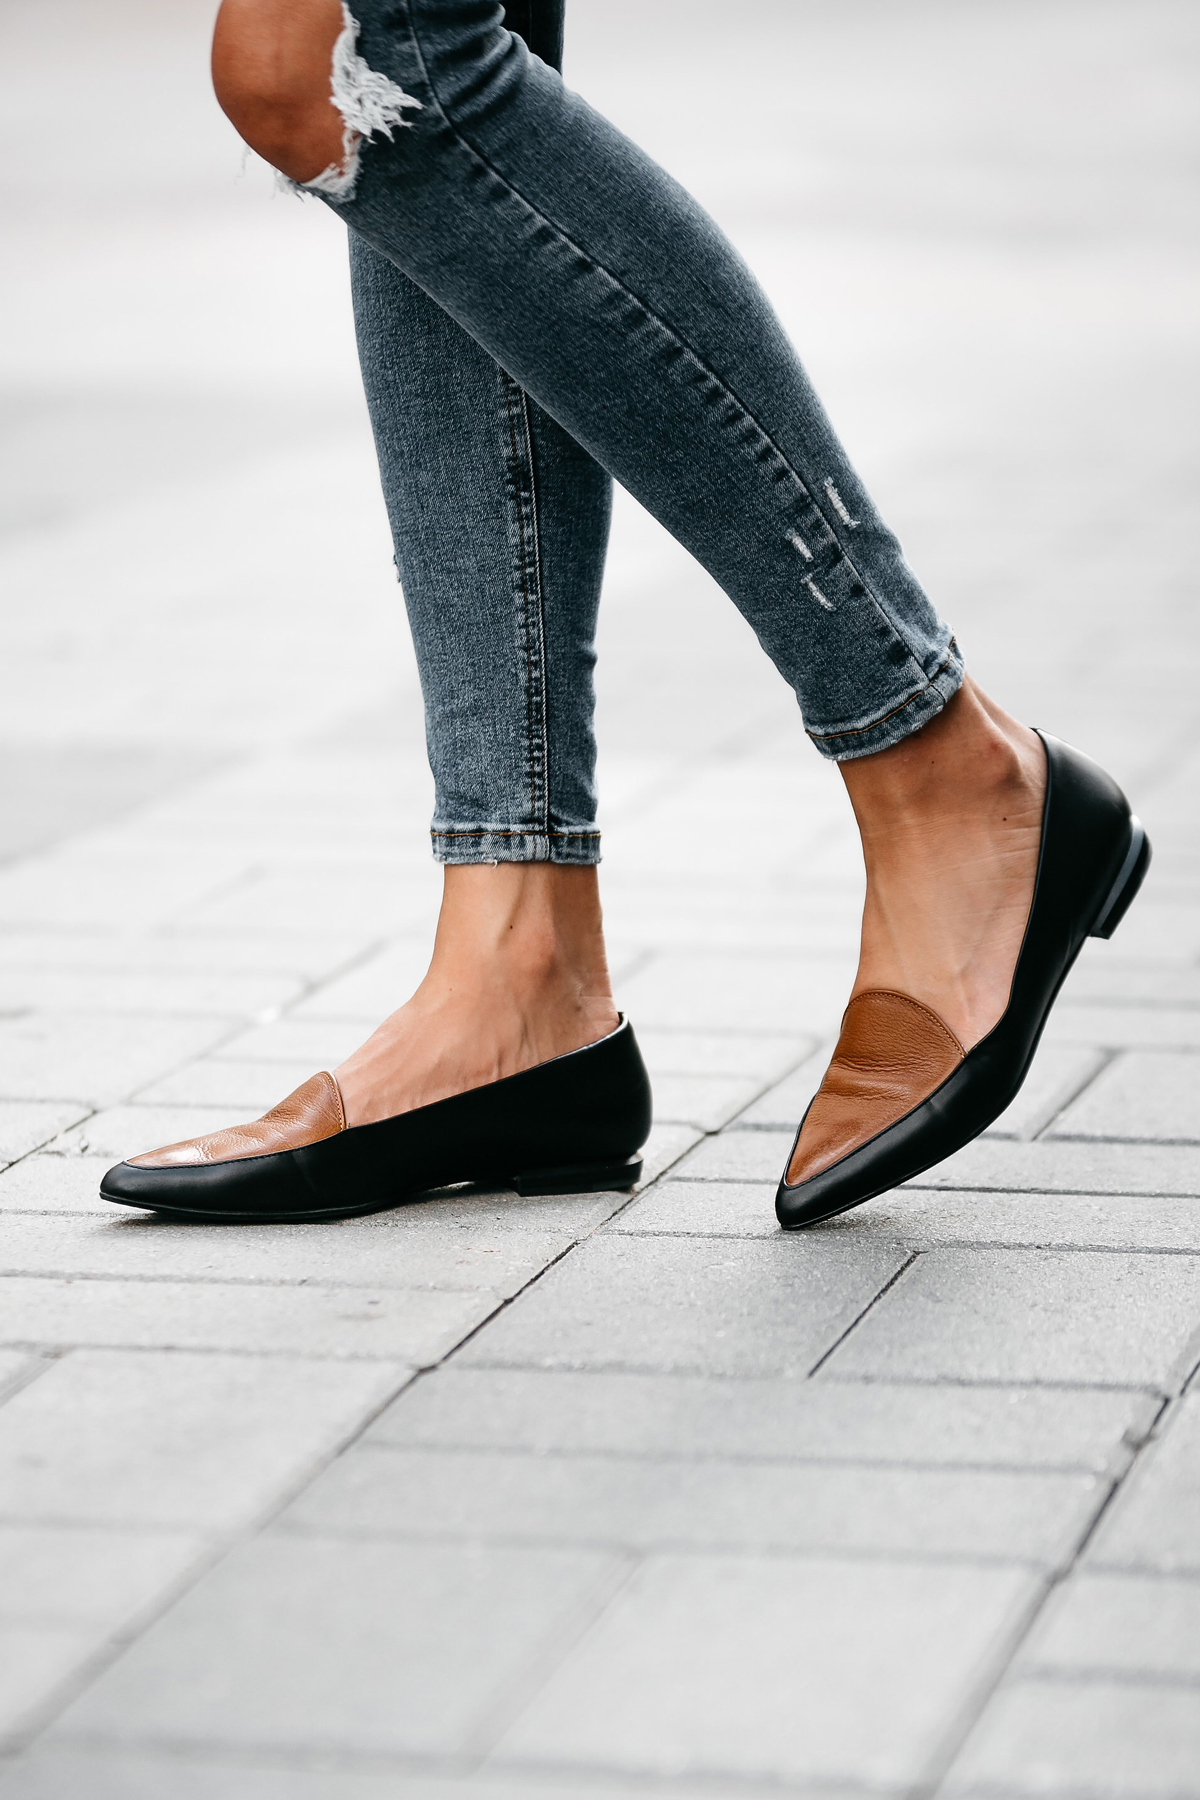 Everlane Black Tan Loafers Fashion Jackson Dallas Blogger Fashion Blogger Street Style